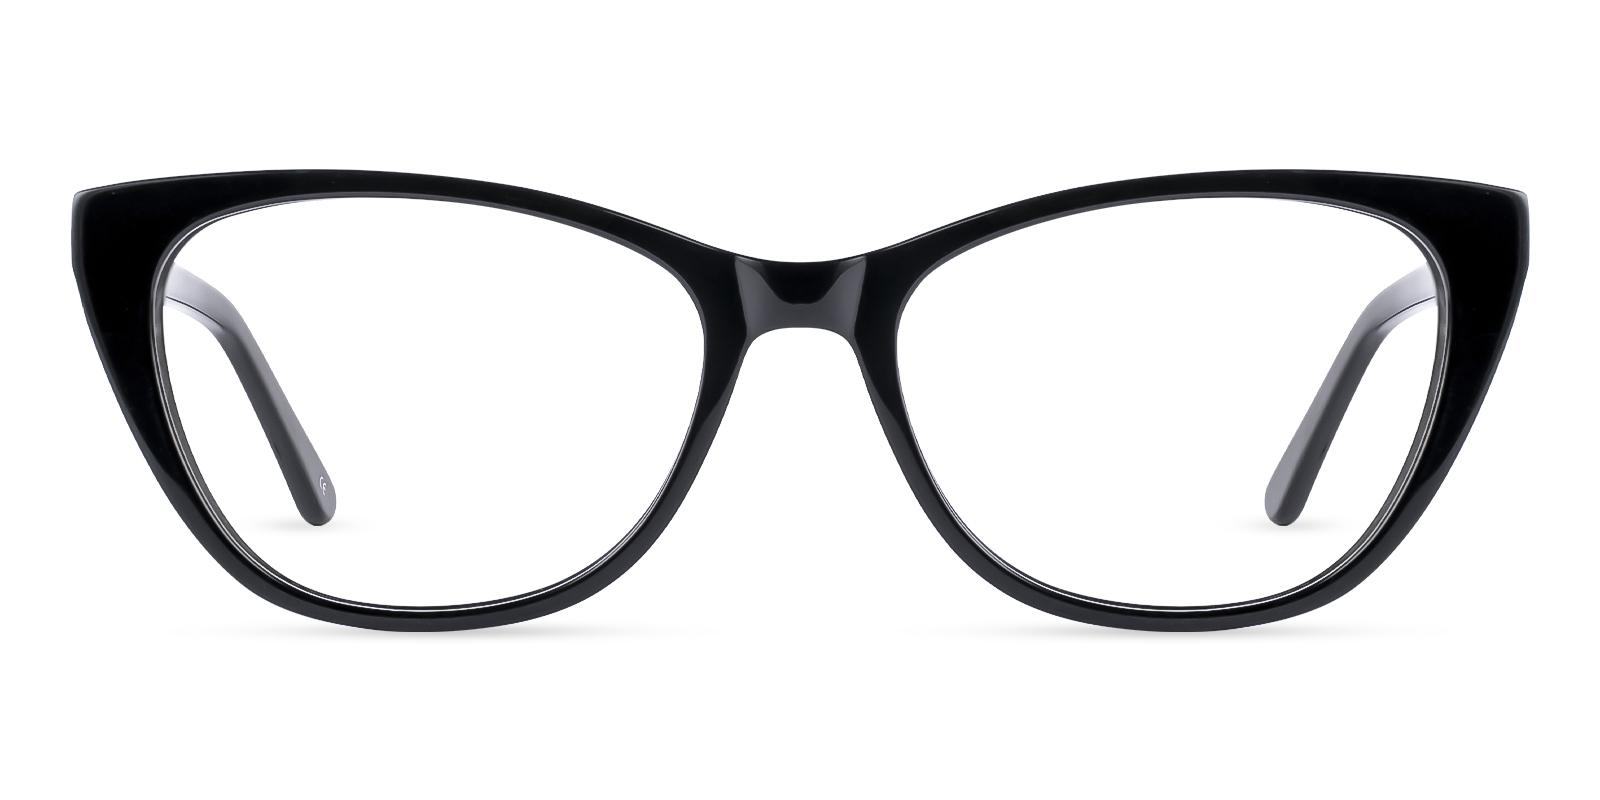 Tune Black Acetate Eyeglasses , SpringHinges , UniversalBridgeFit Frames from ABBE Glasses